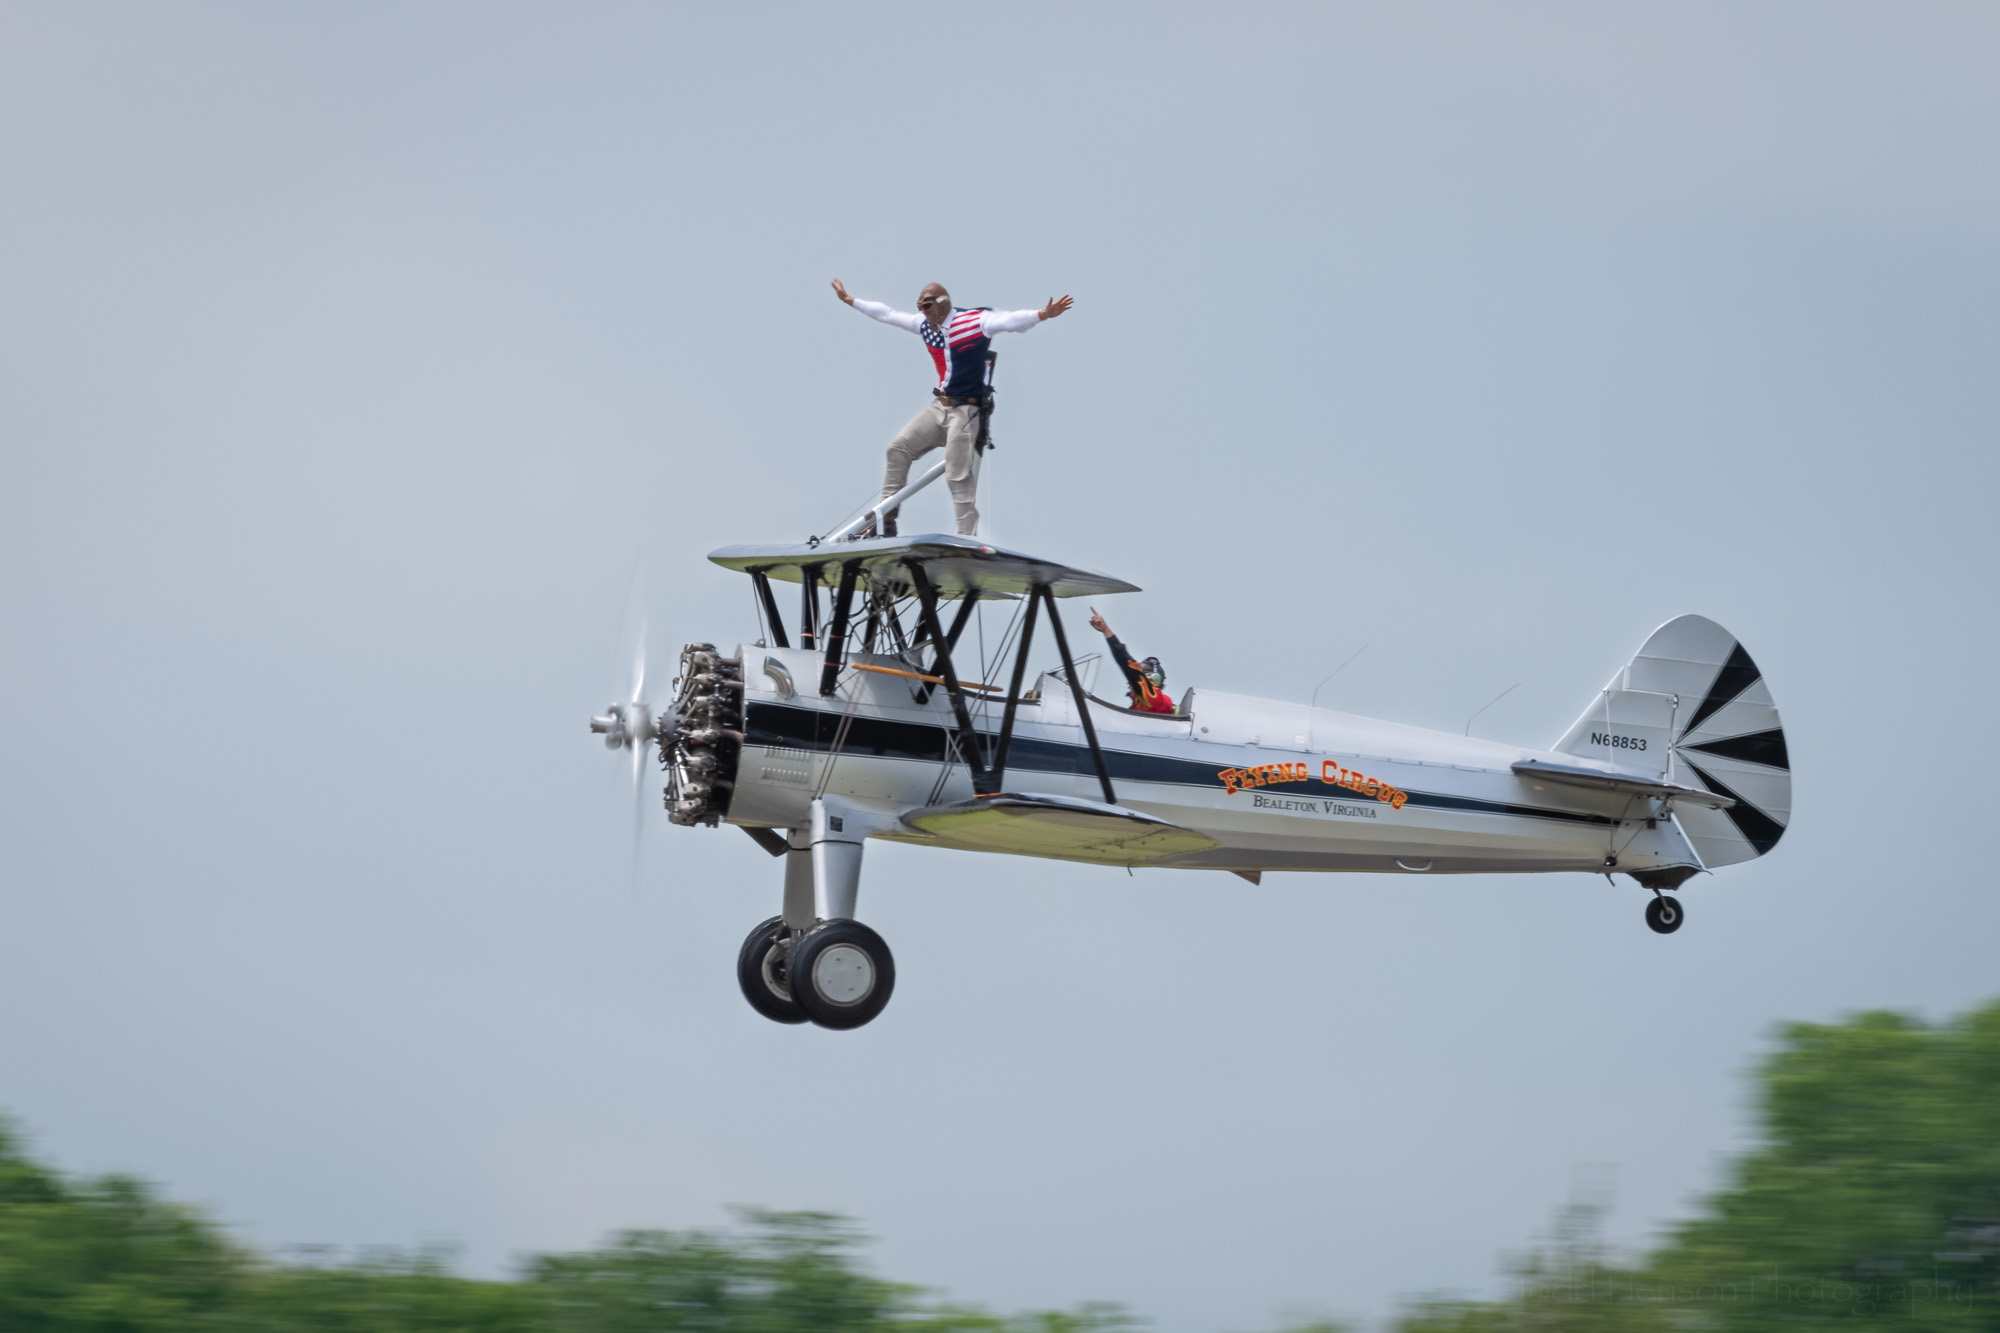 The Bealeton Flying Circus Wingwalkers